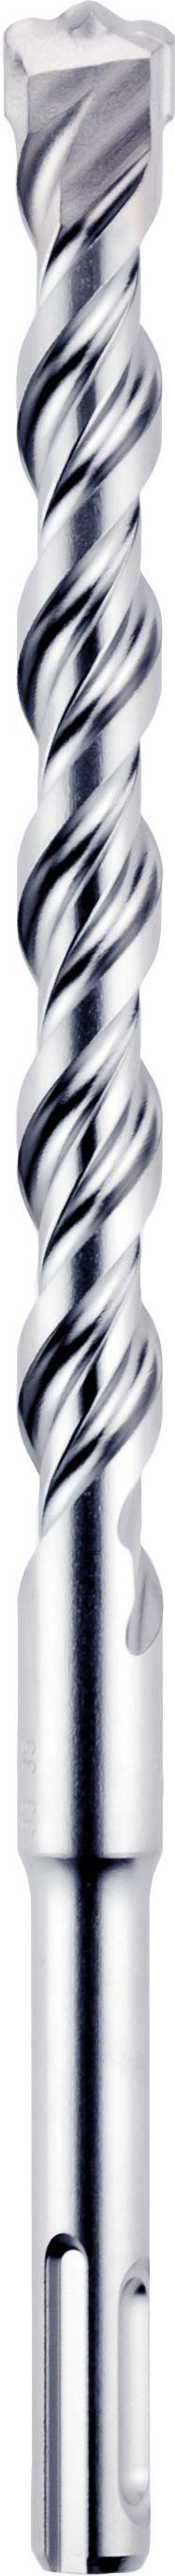 Slika BORER Rocket 3 SDS-plus 16x210 mm